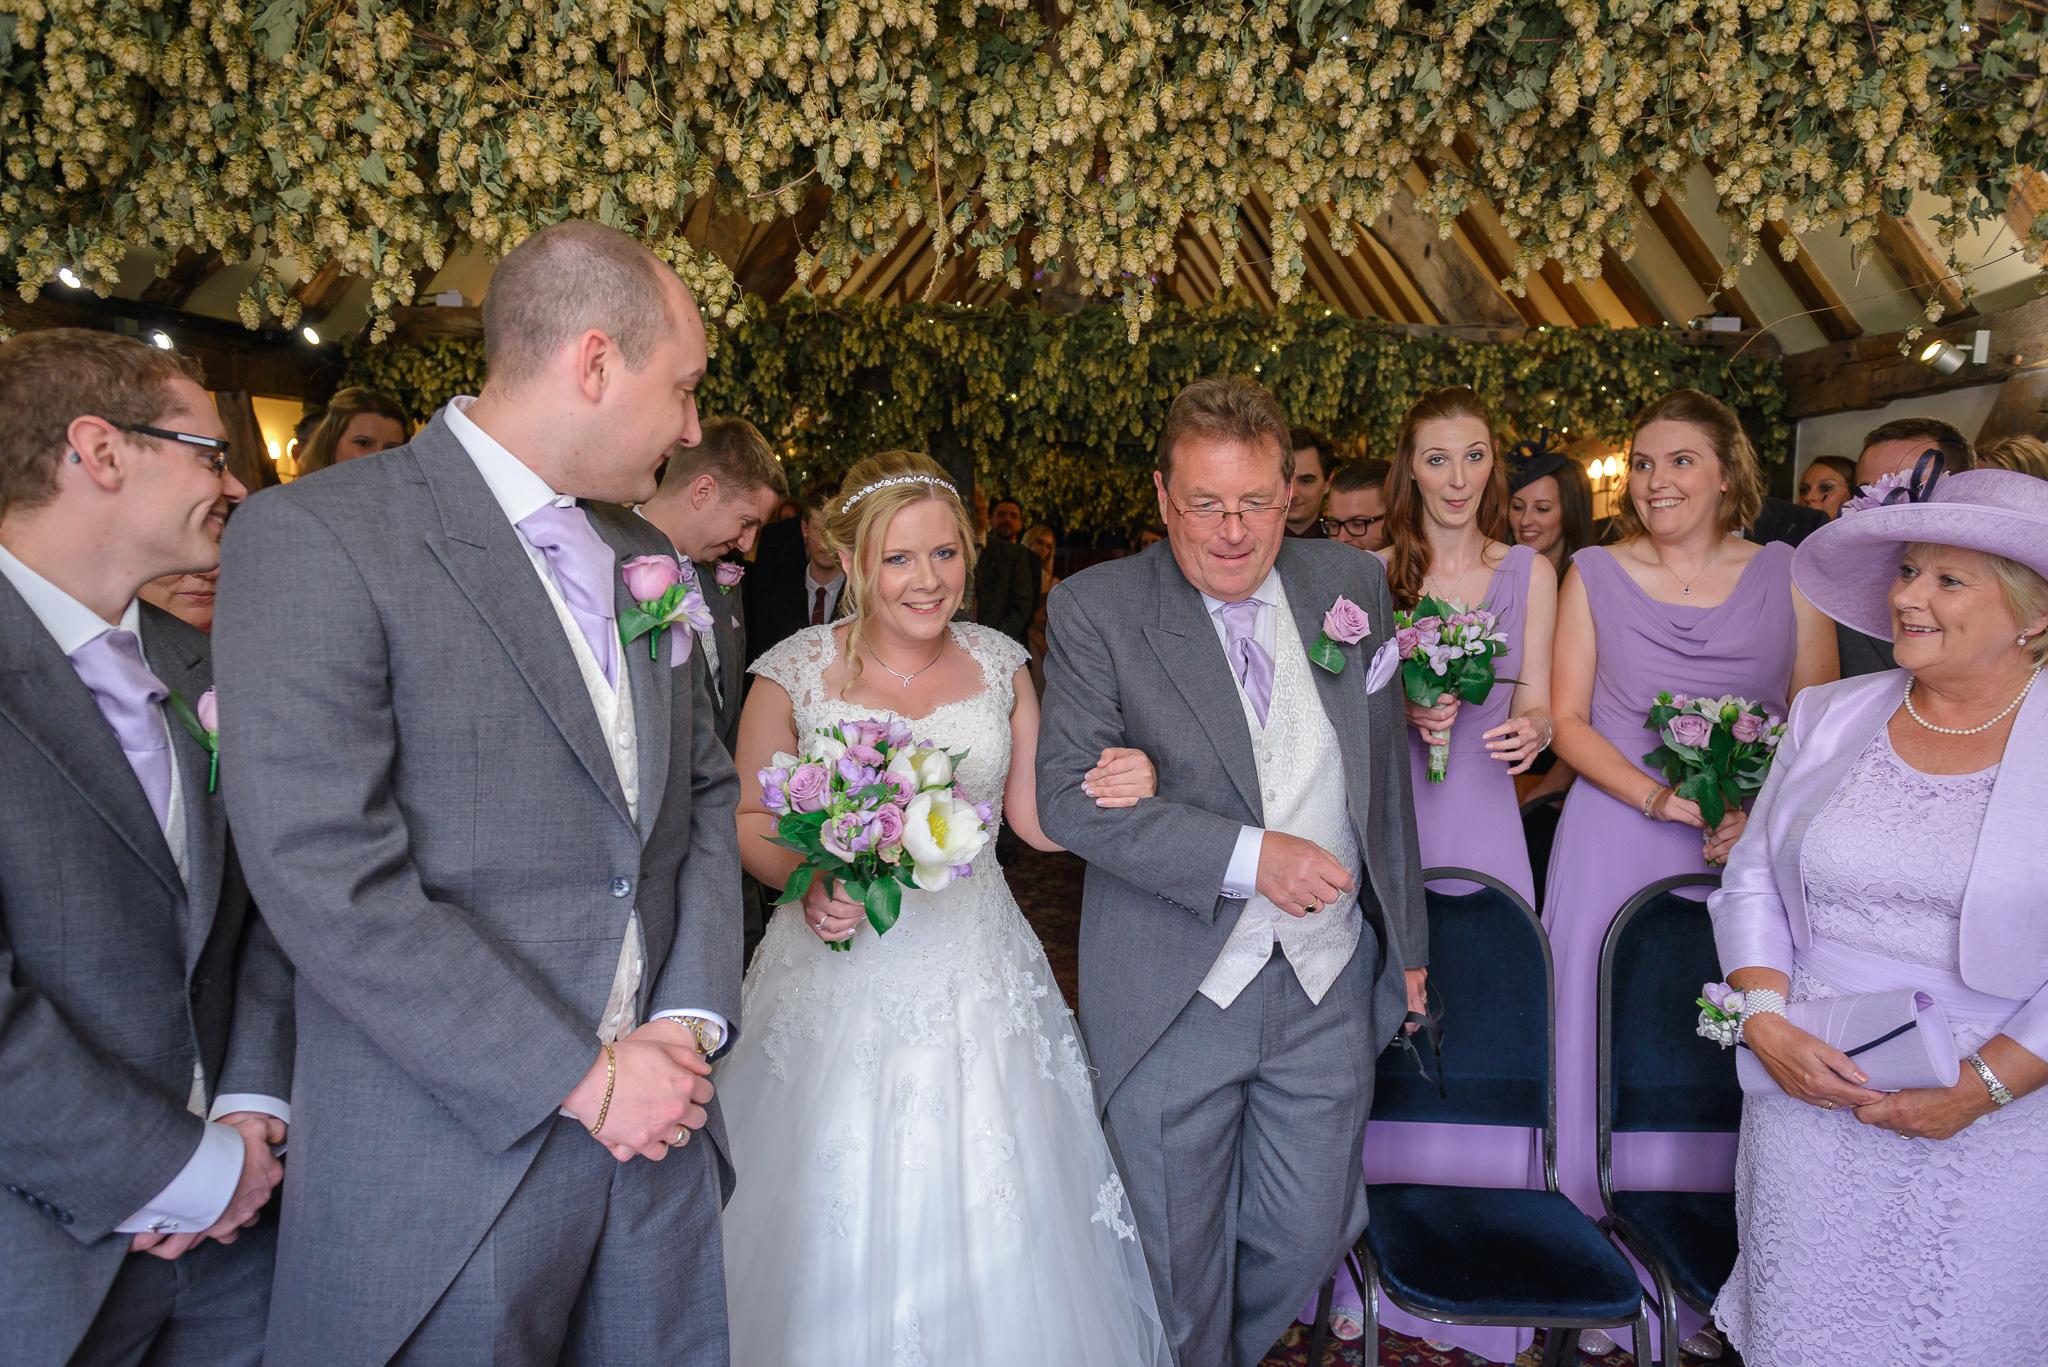 Faversham-Wedding-Jennifer-Andrew-23